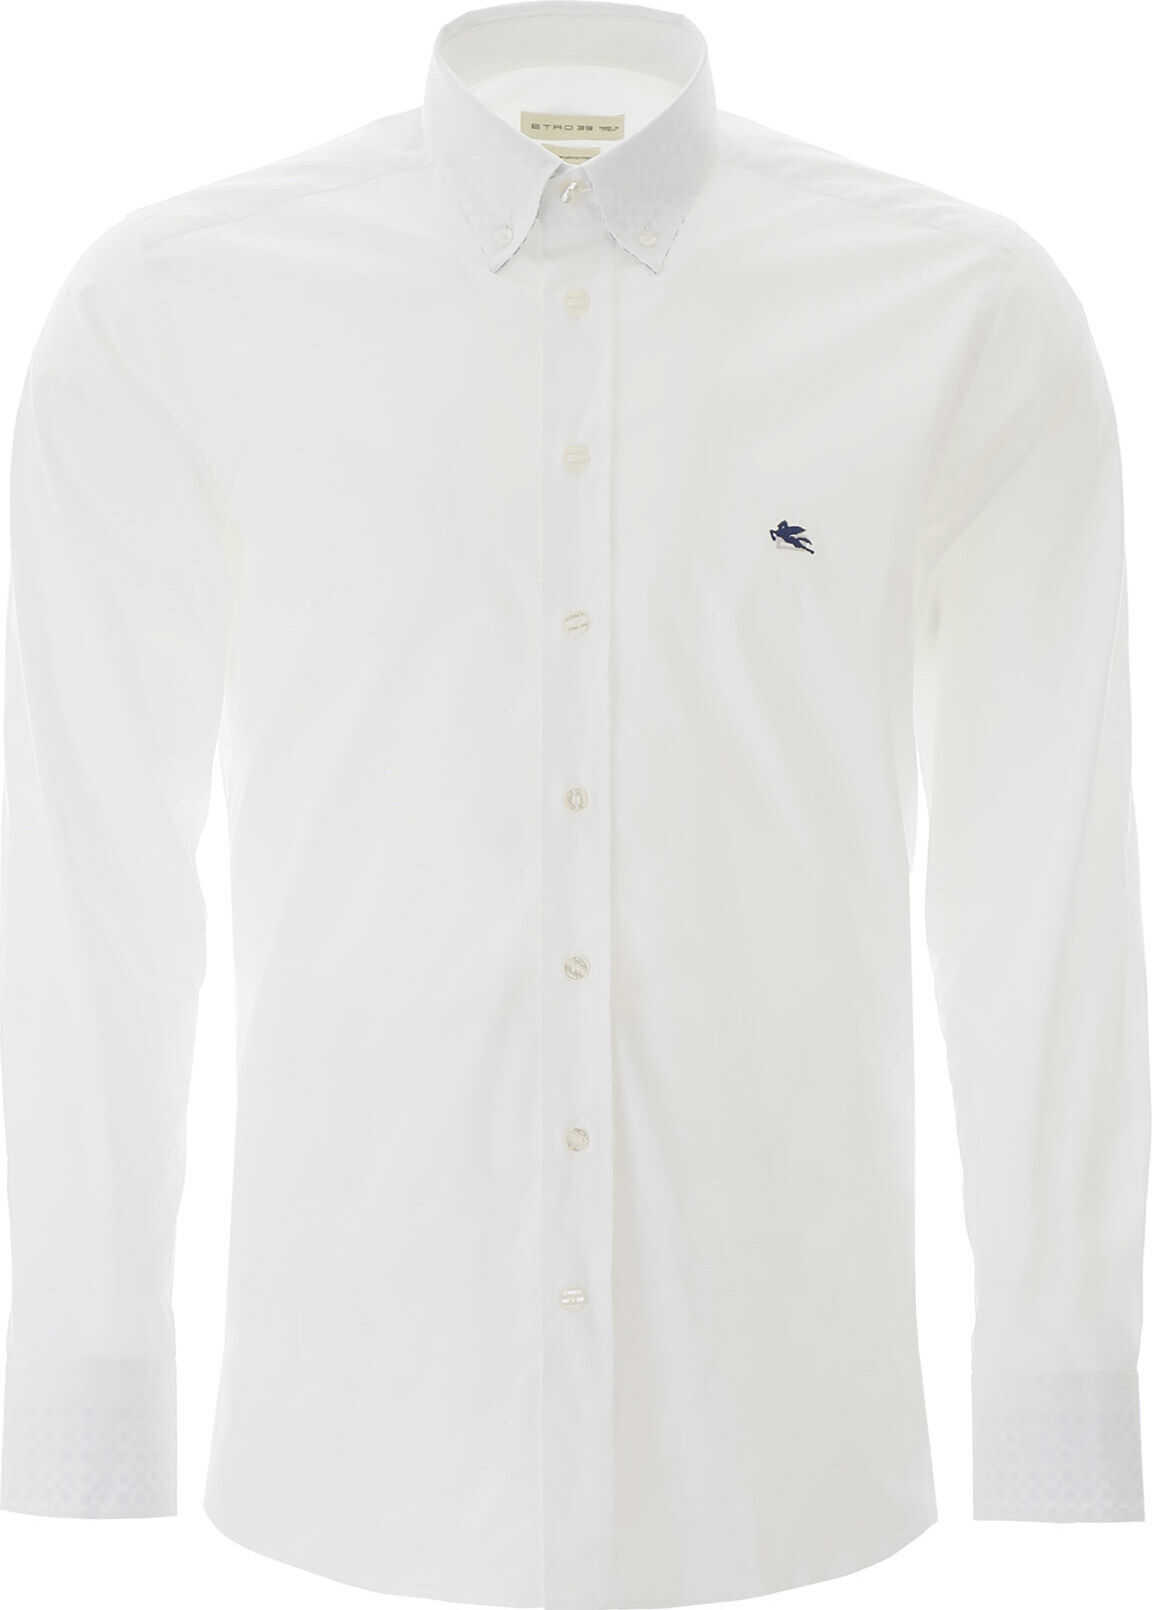 ETRO Button-Down Shirt With Pegaso Embroidery BIANCO